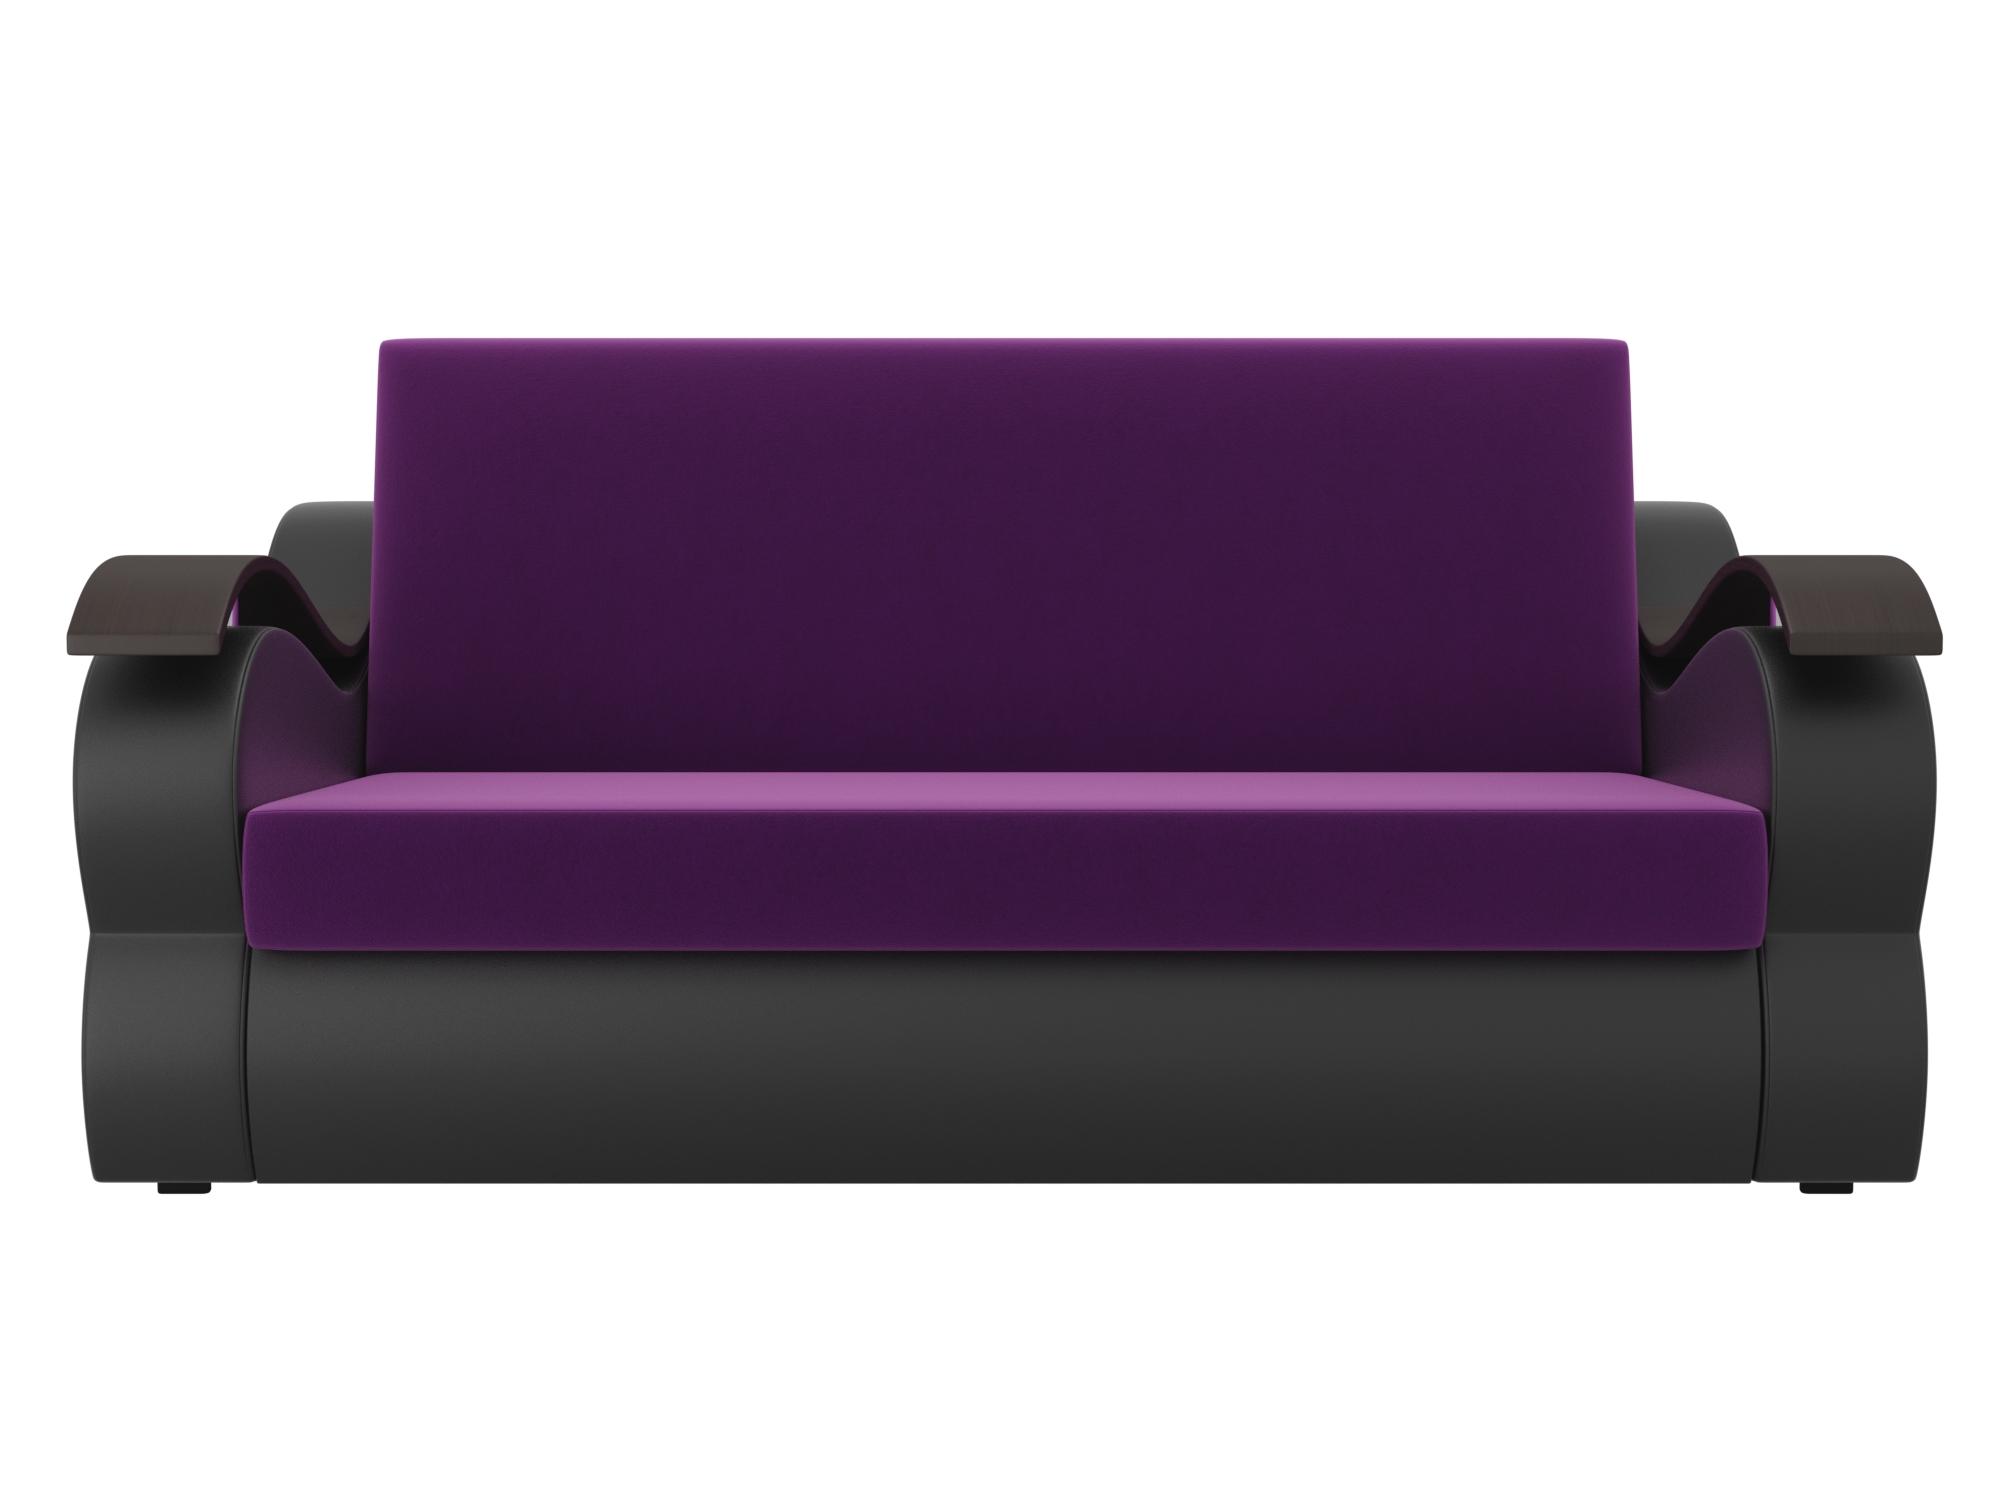 Диван Меркурий (160х190) MebelVia Фиолетовый, Черный